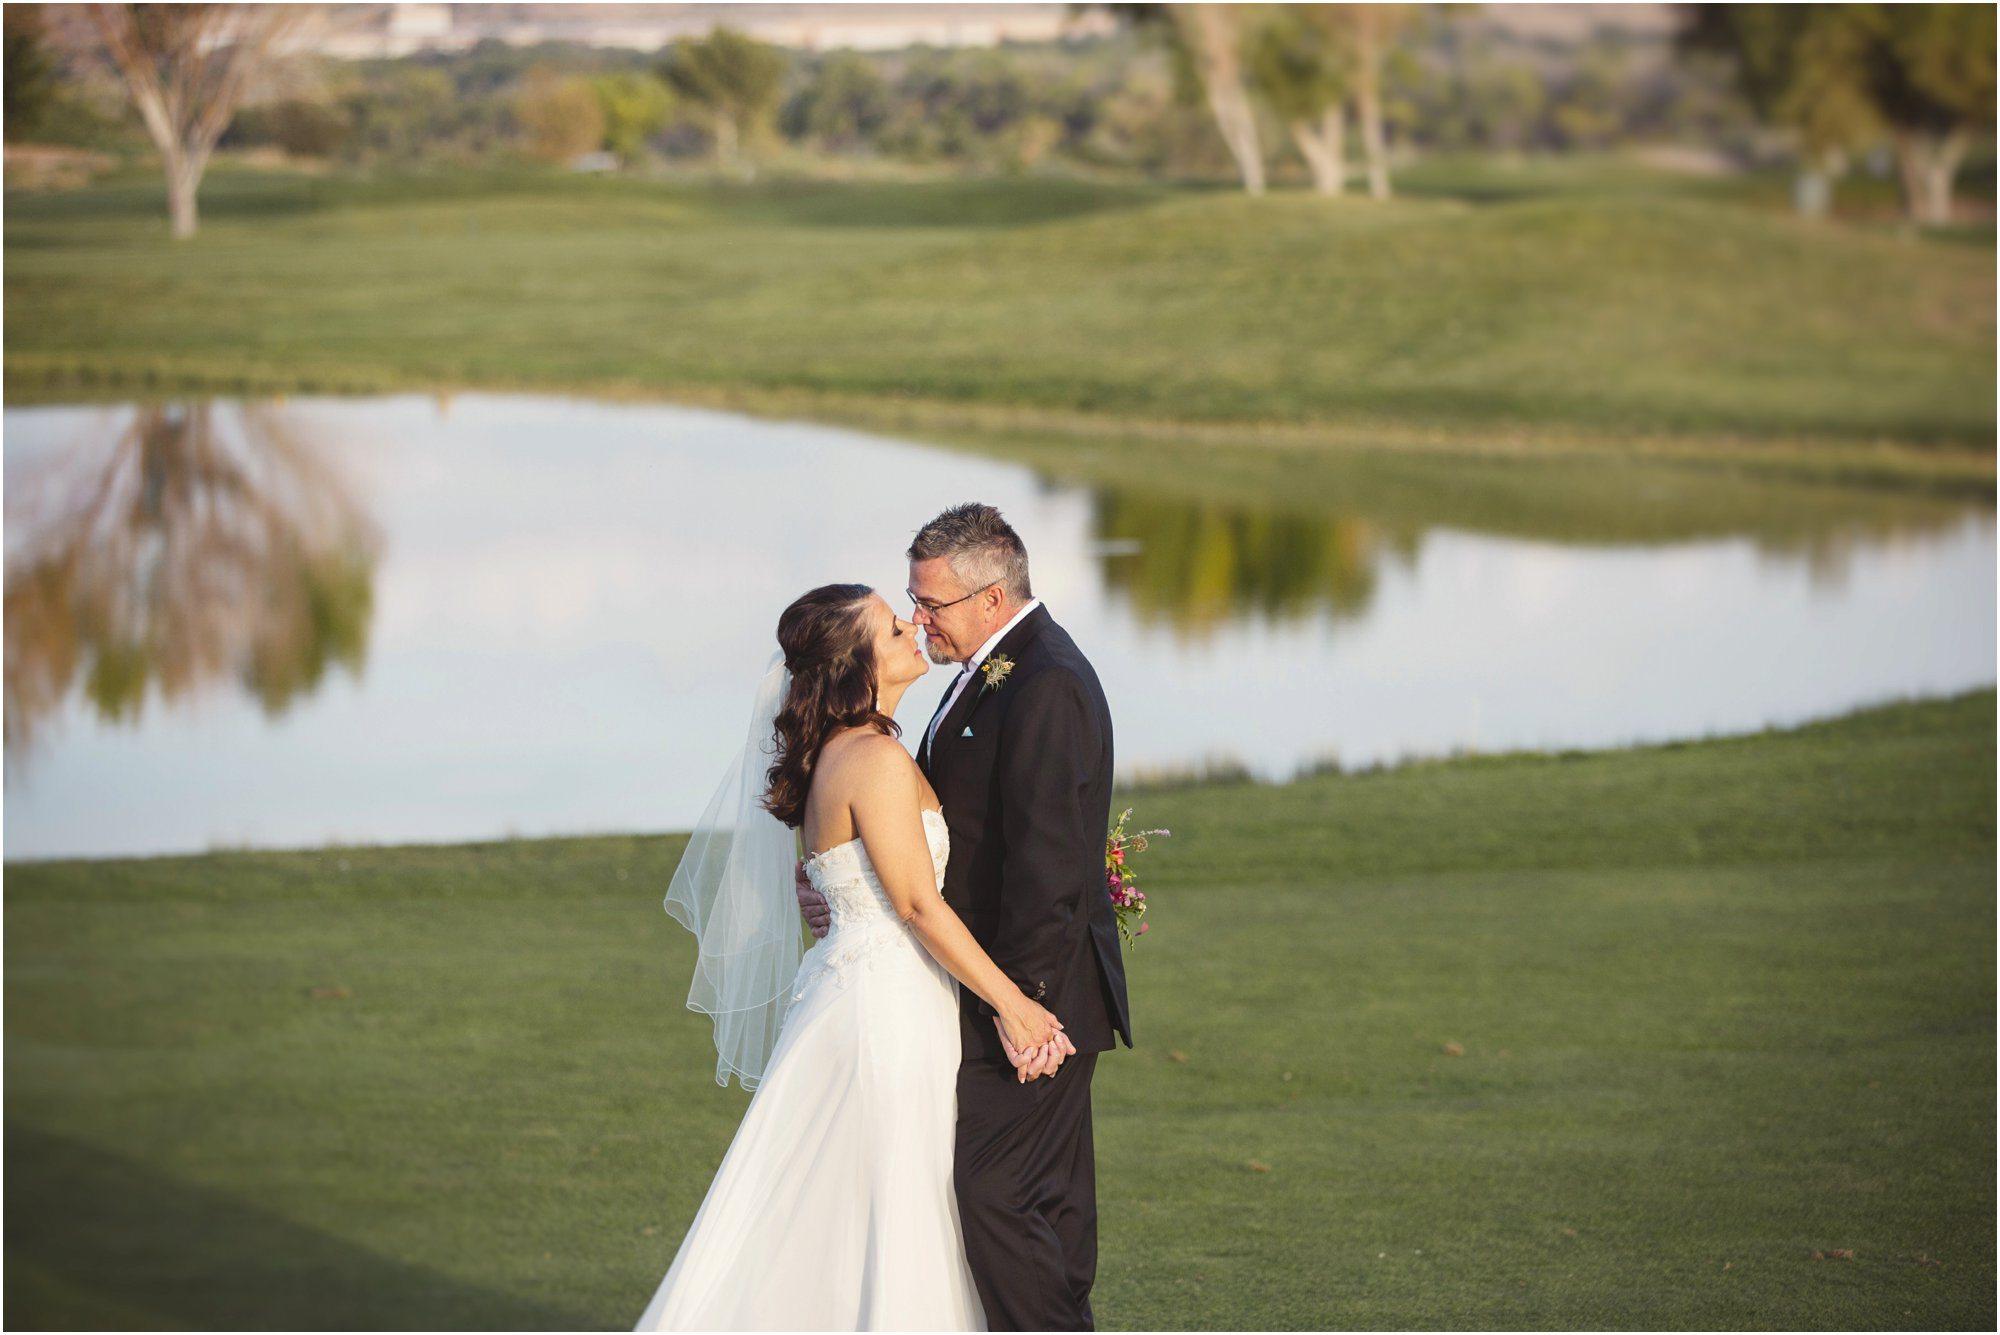 061BlueRosePhotography_ Albuquerque wedding photographers